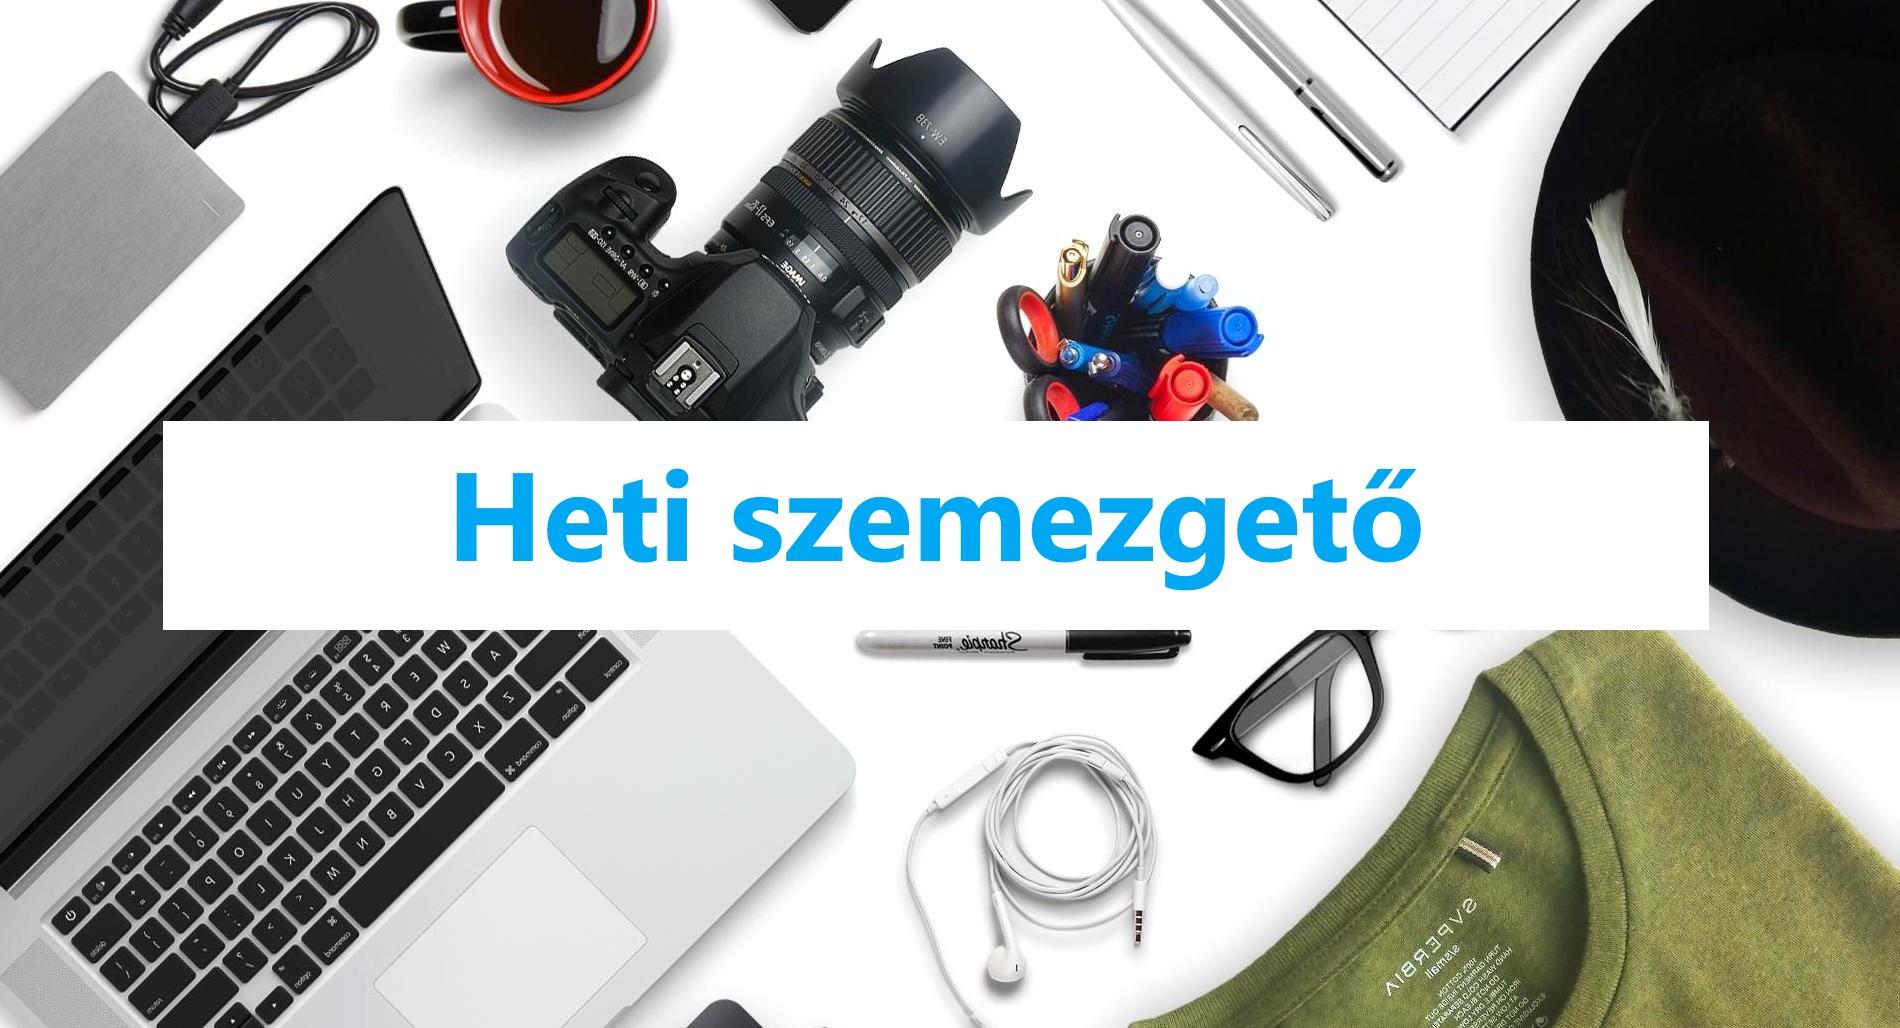 heti_szemezgeto_uj_36.jpg